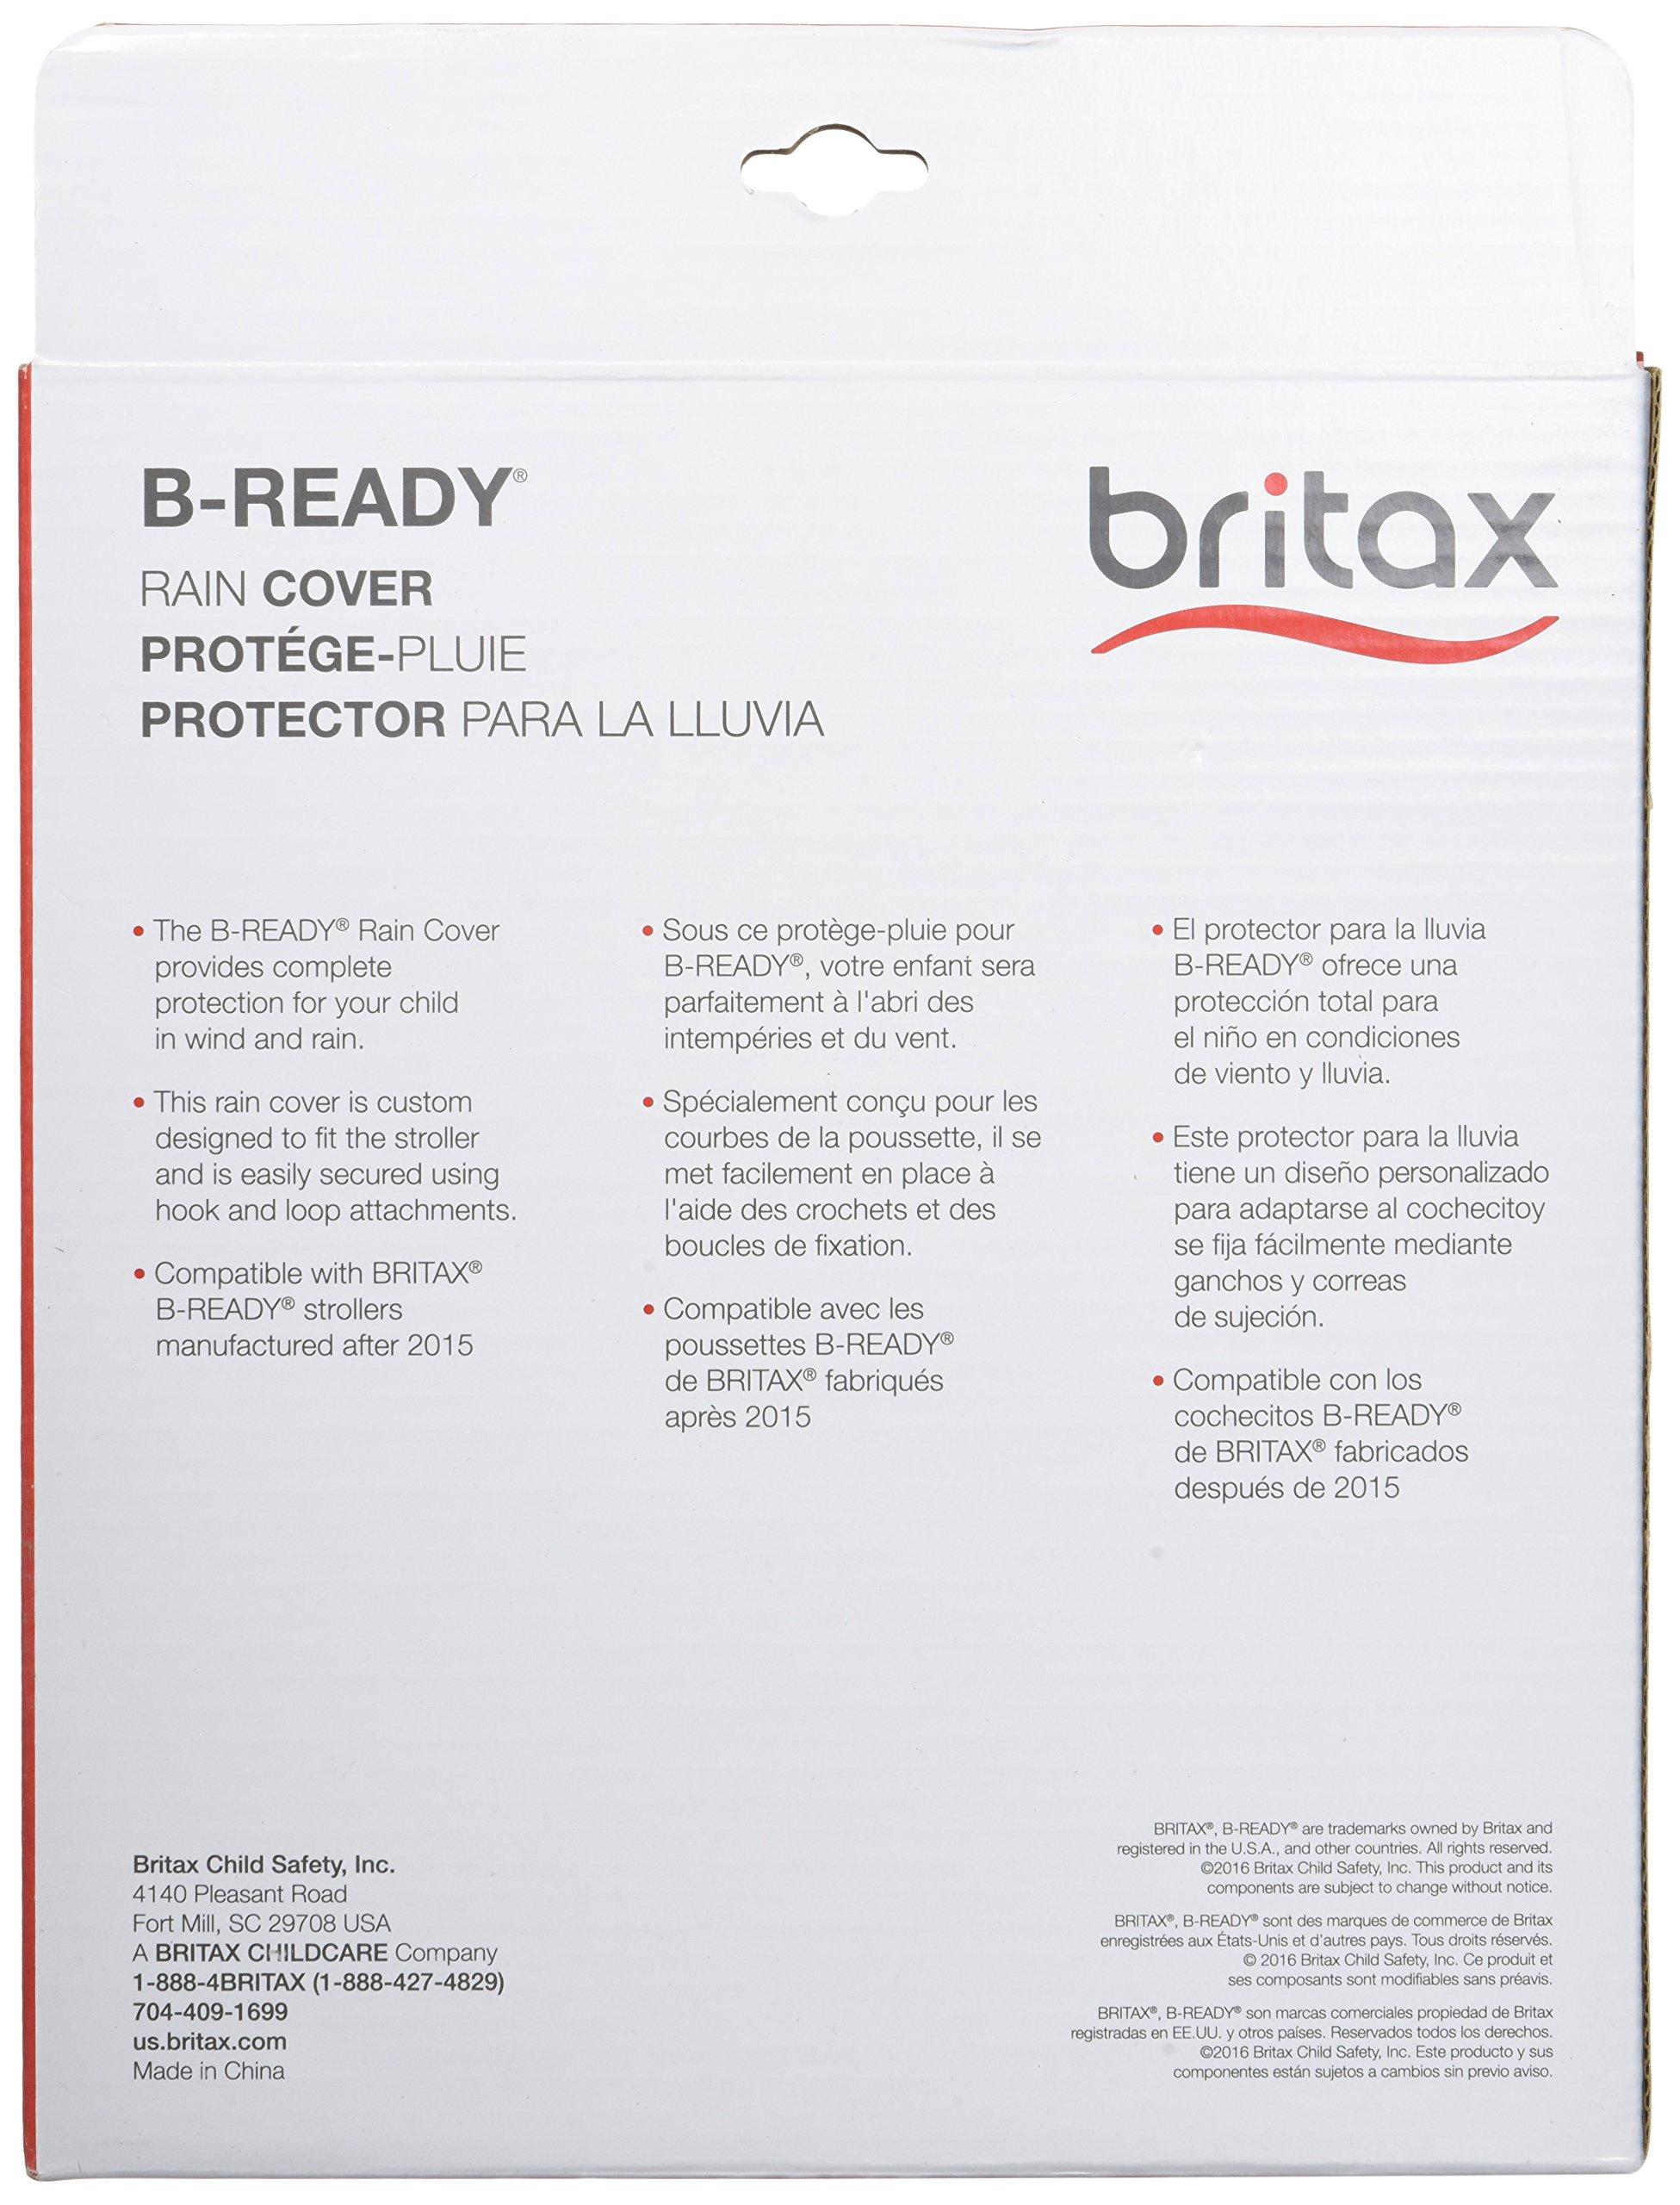 Britax B-Ready Stroller Wind and Rain Cover